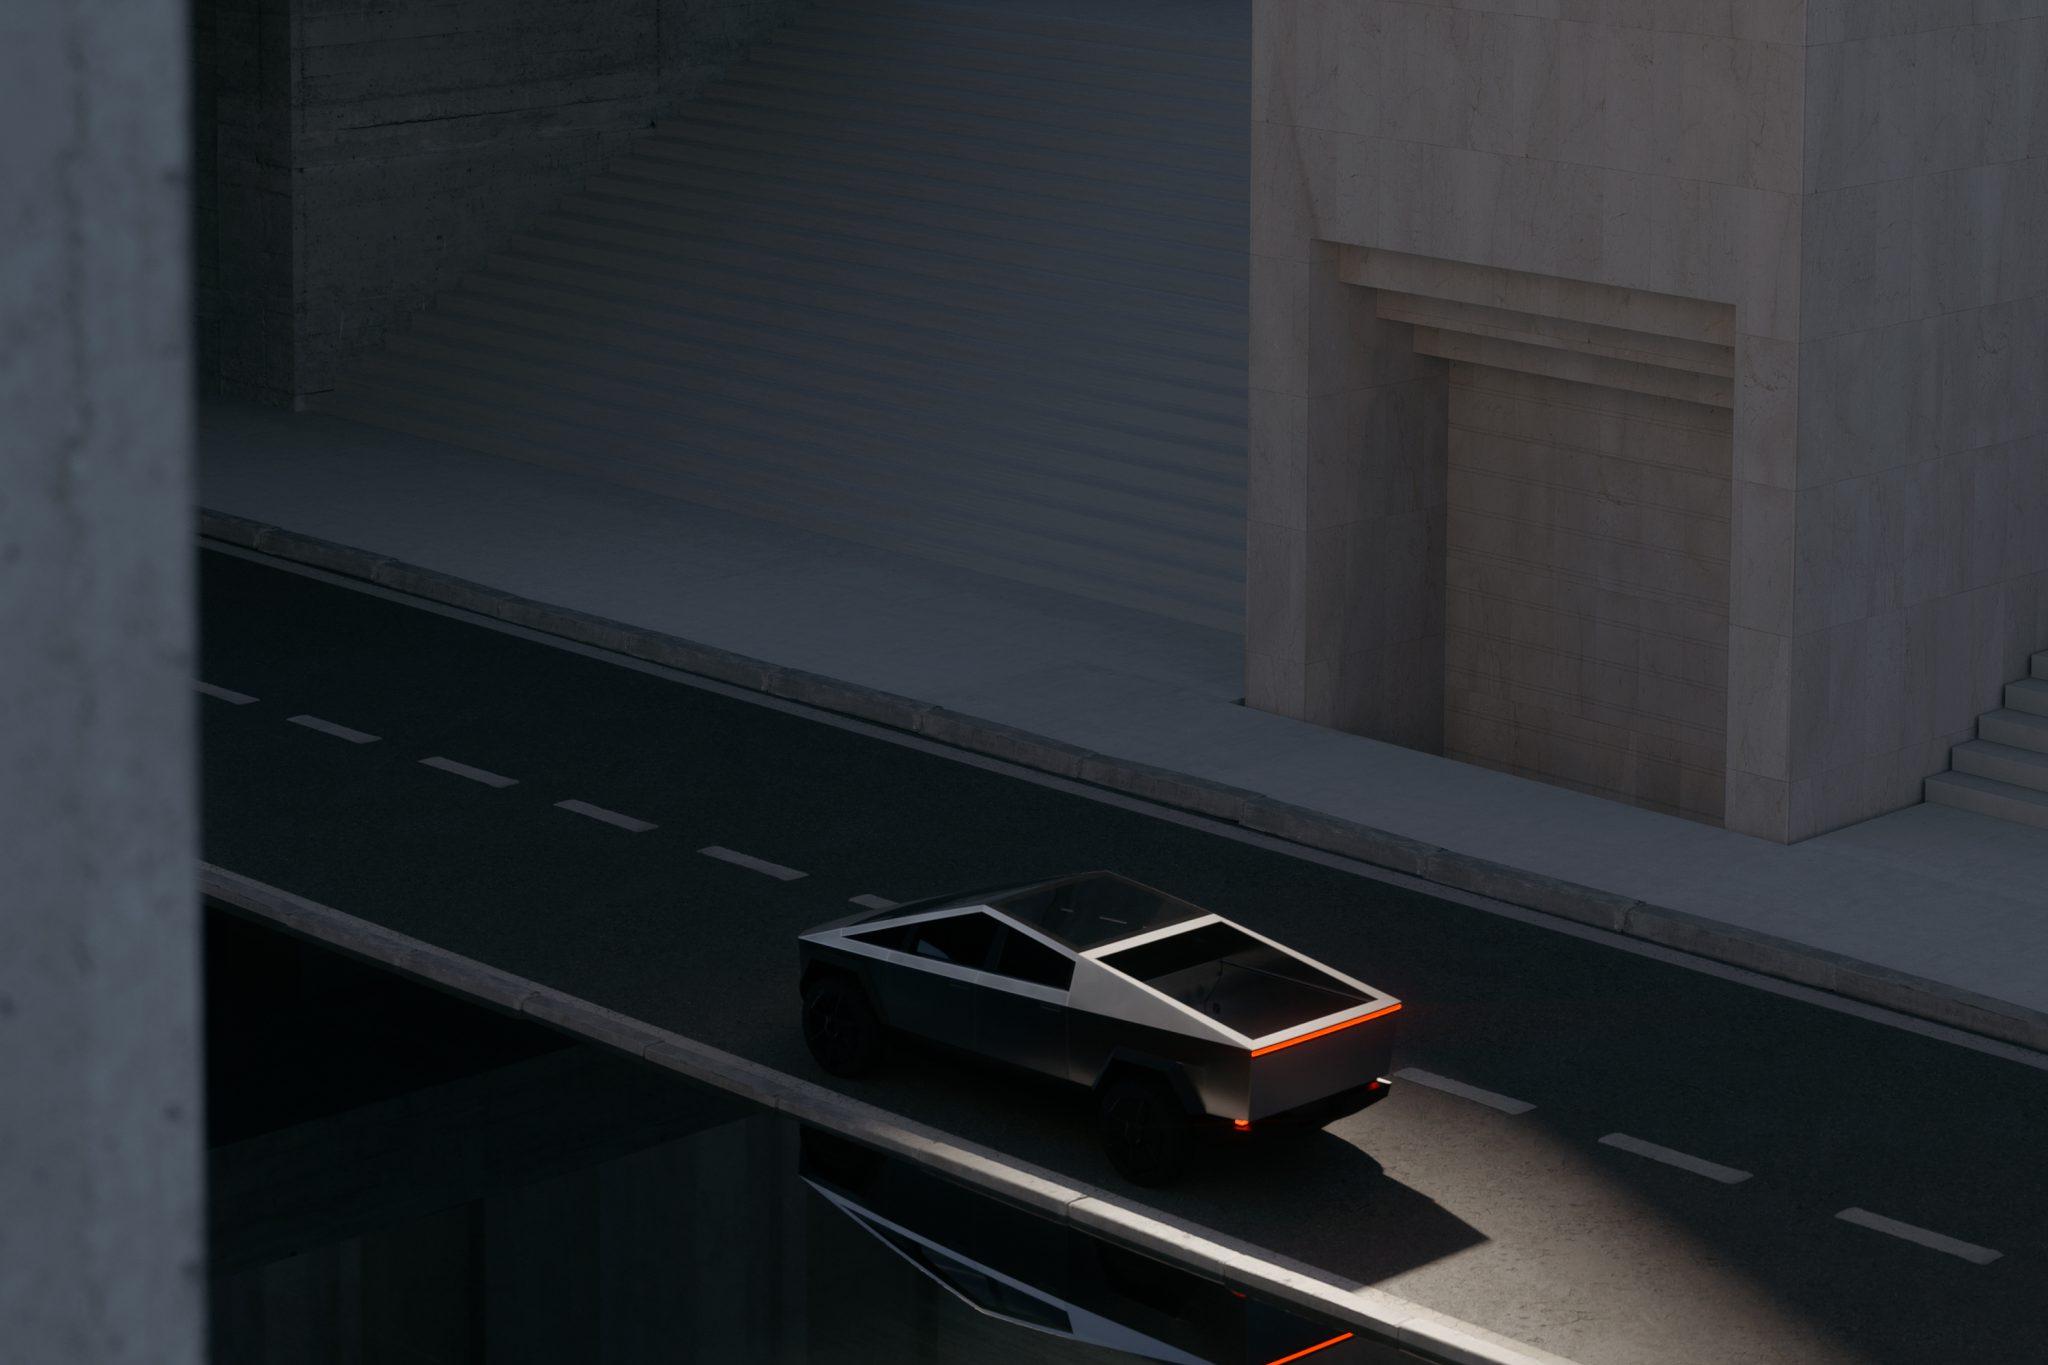 ignant-tesla-cybertruck-cgi-brutalism-cgi-editorial-2-2048×1365